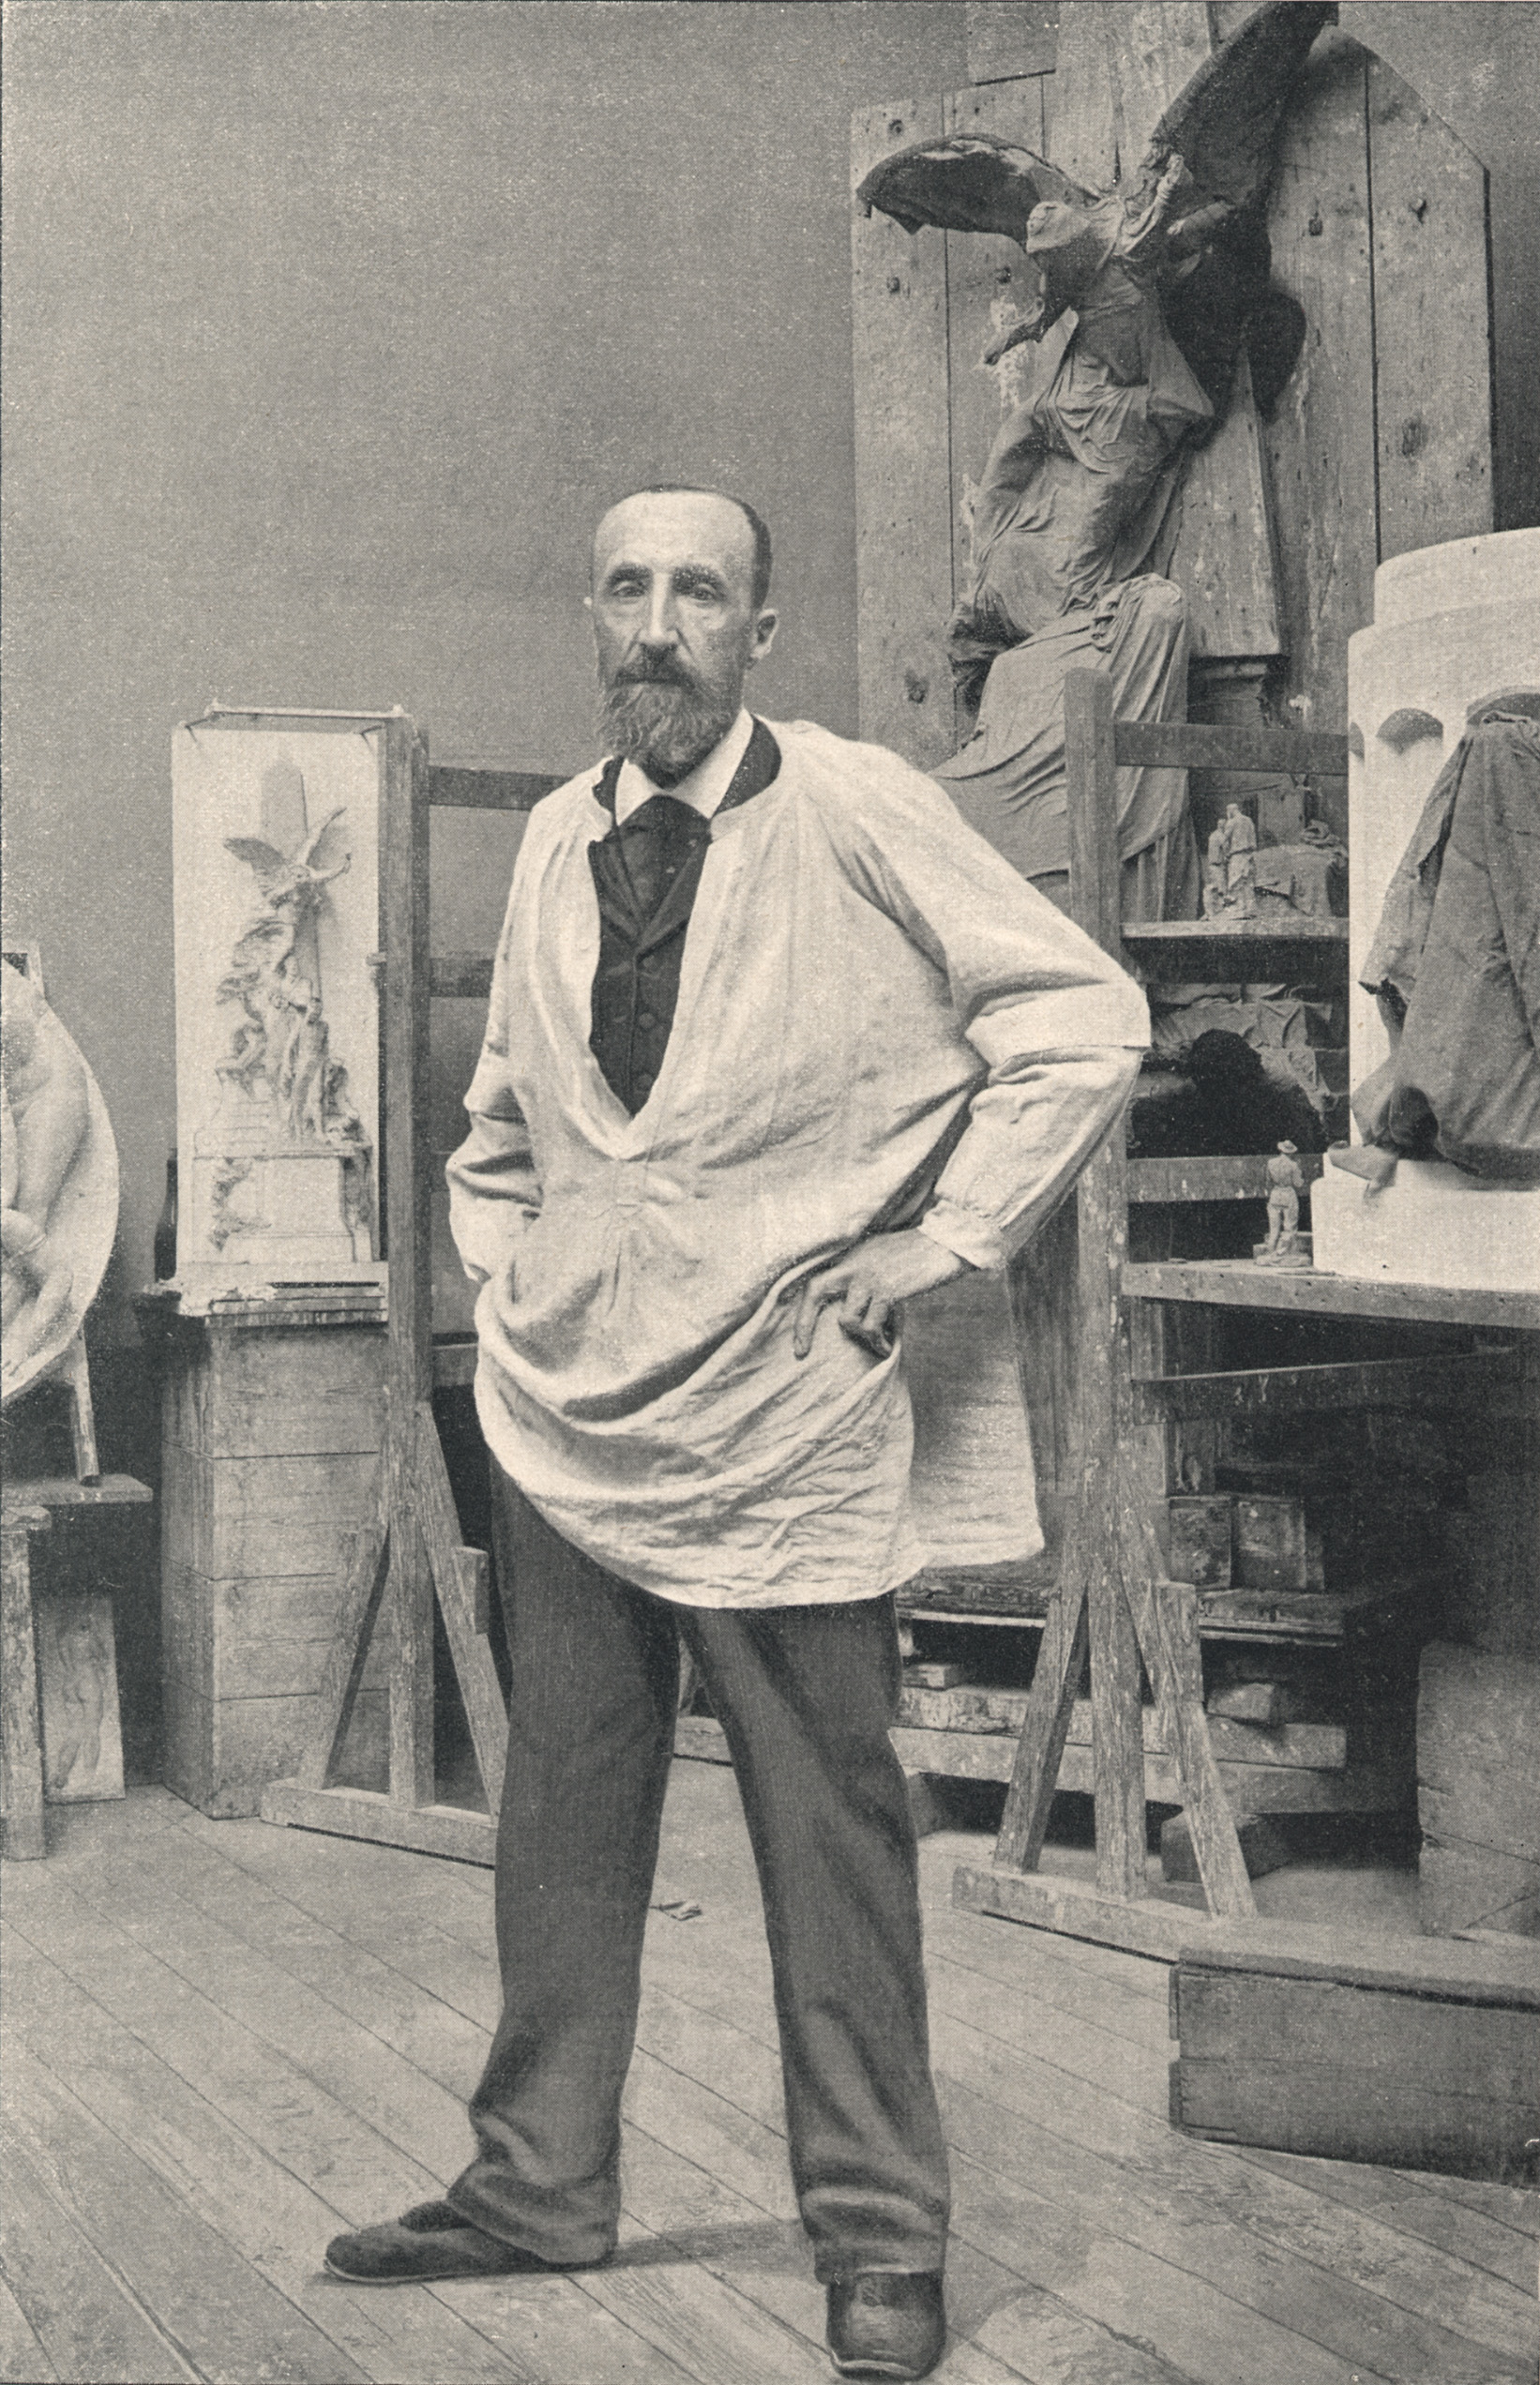 Depiction of Jules Dalou